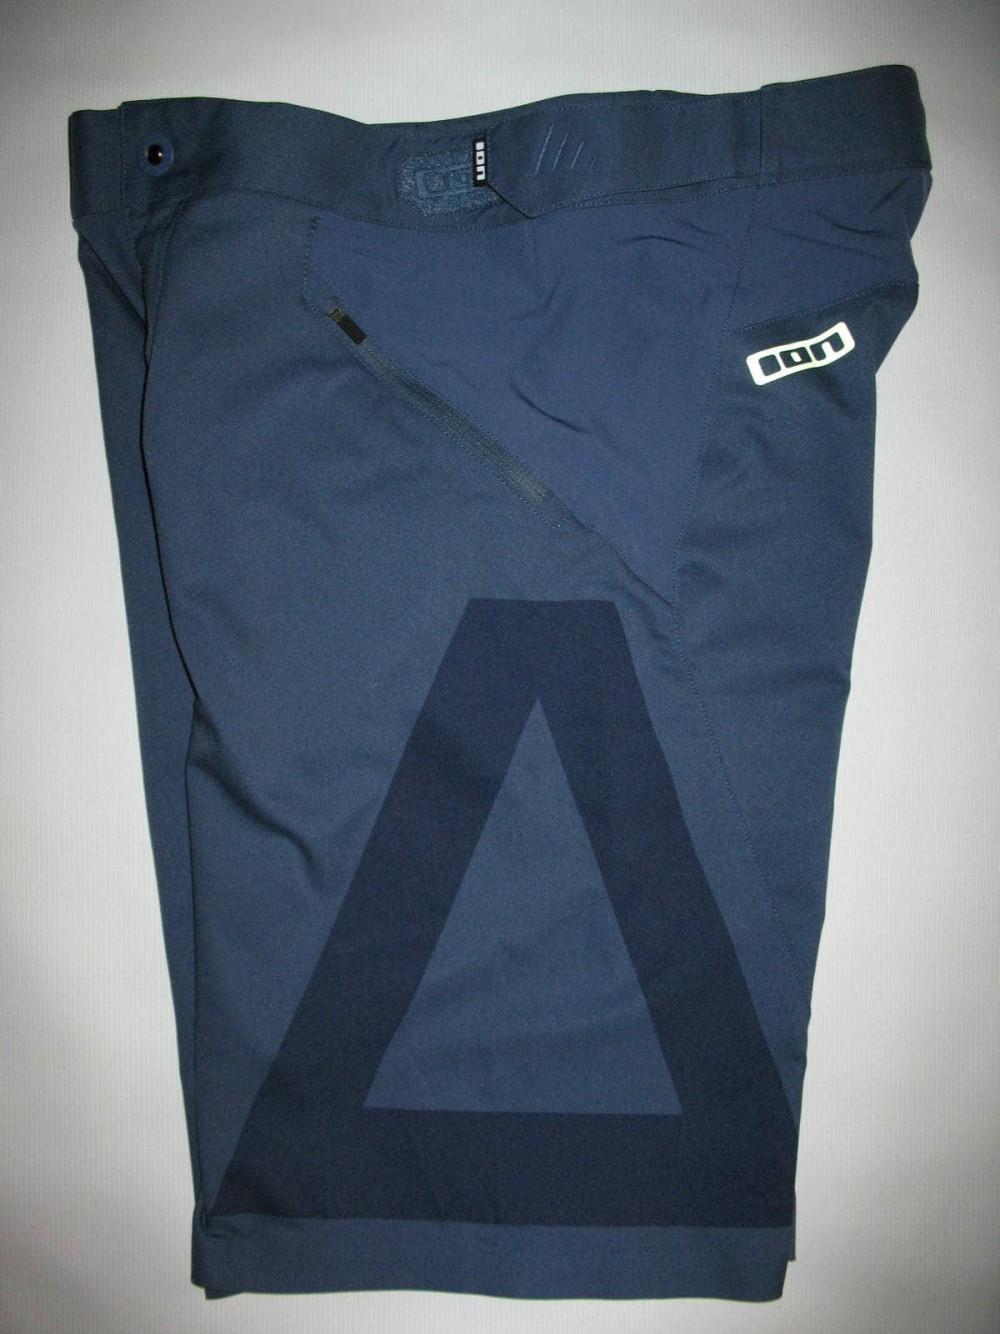 Велокомплект ION traze MTB 2/3jersey-shorts (размер 32-M) - 8